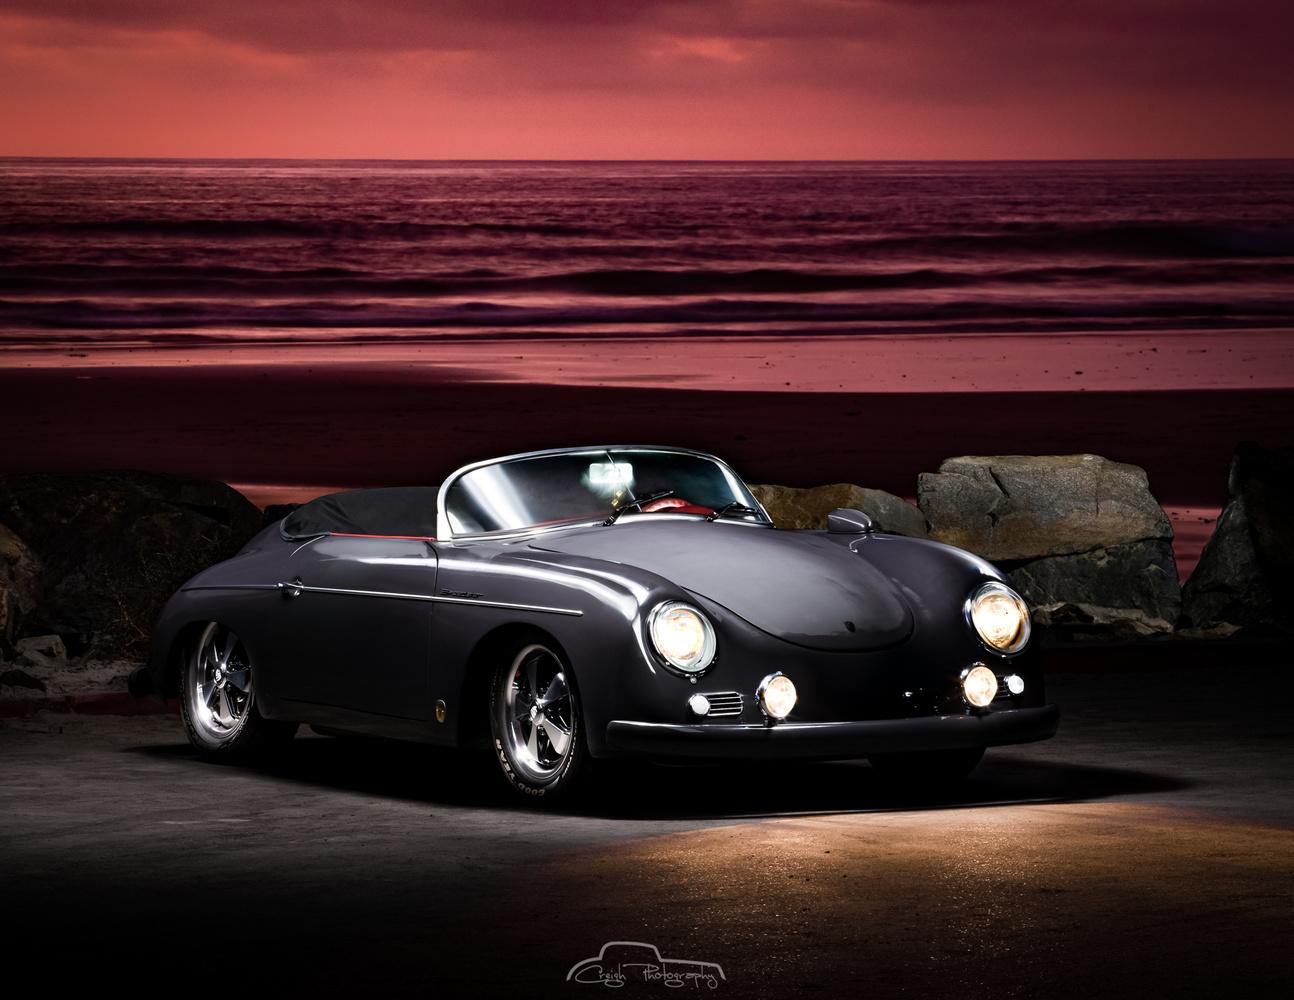 Porsche 356 at the Beach by Creigh McIntyre